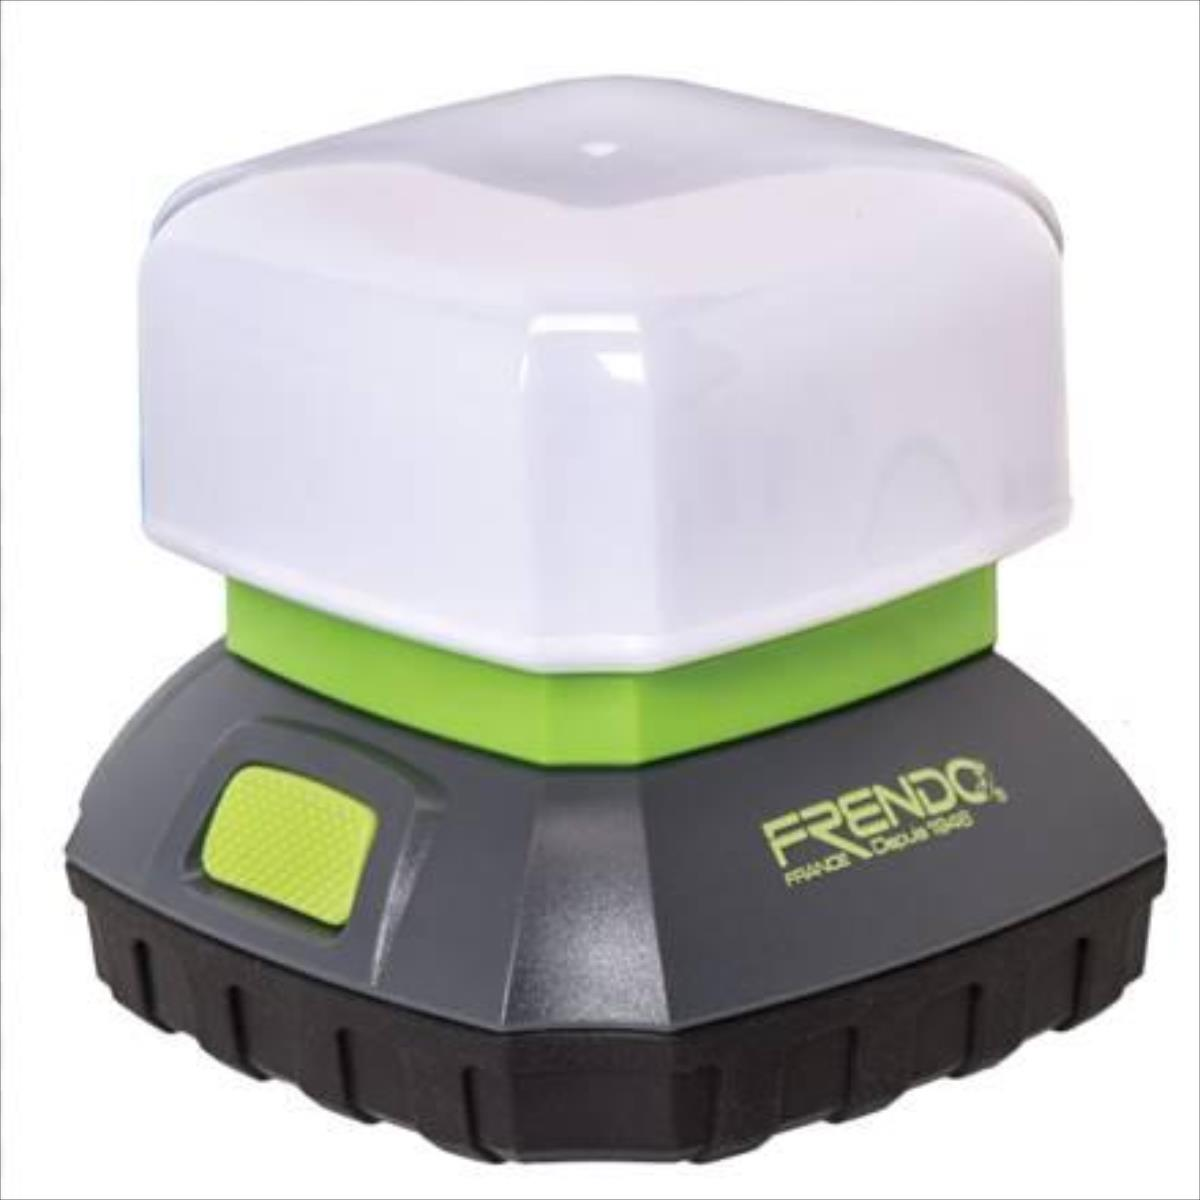 Frendo Mini Power LED lantern, 1 LED CREE, 3 lighting modes: 25-55-102Lm, 4xLR06(AA) not incl. kabatas lukturis